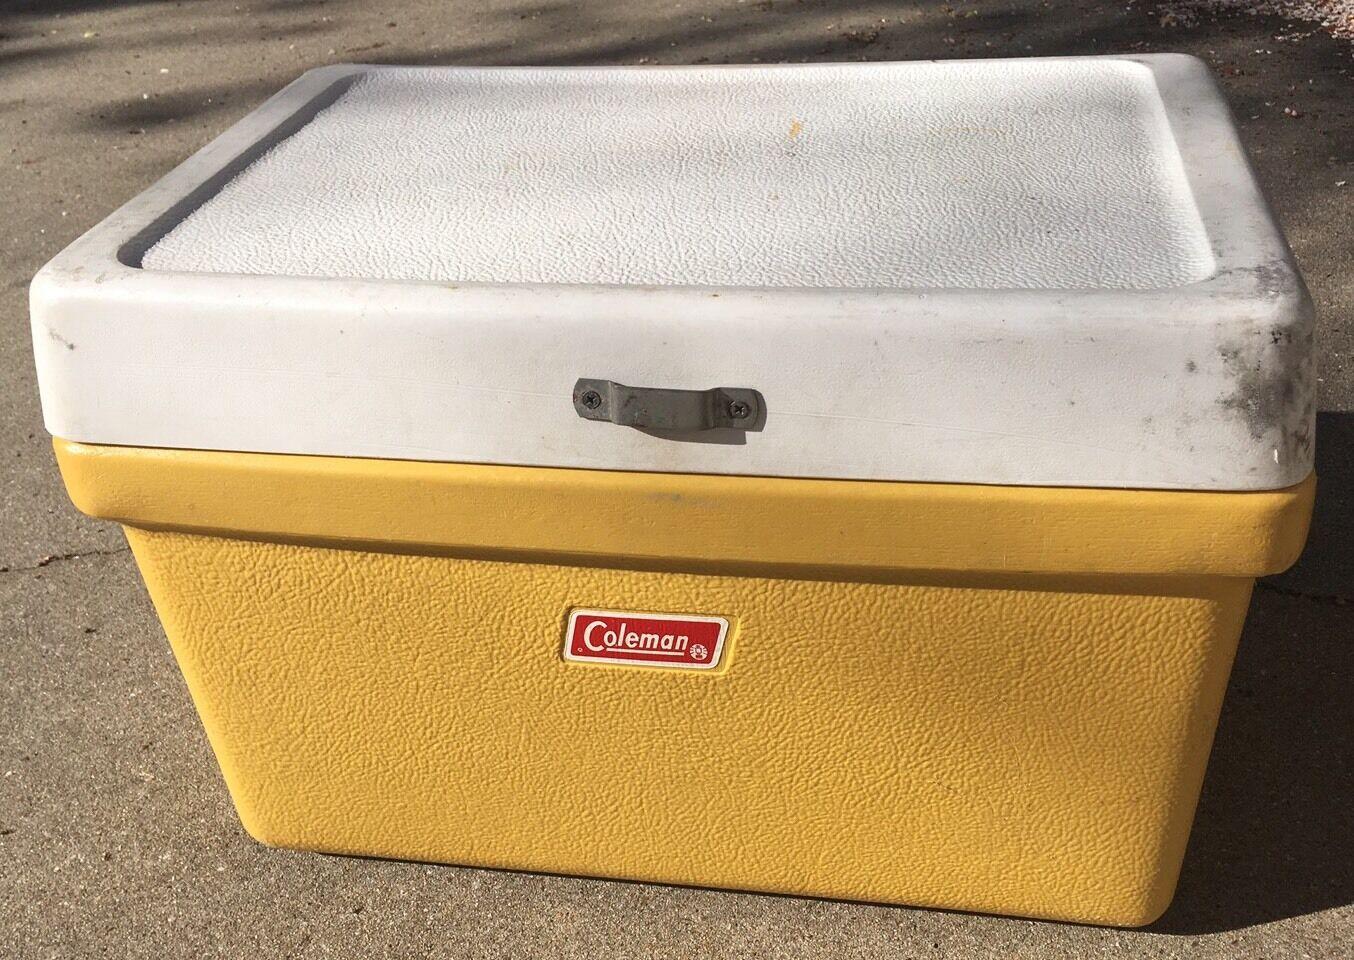 Vintage Coleman Metal  Handle Mustard Yellow  Plastic Cooler Dated 1976 Antique  100% genuine counter guarantee